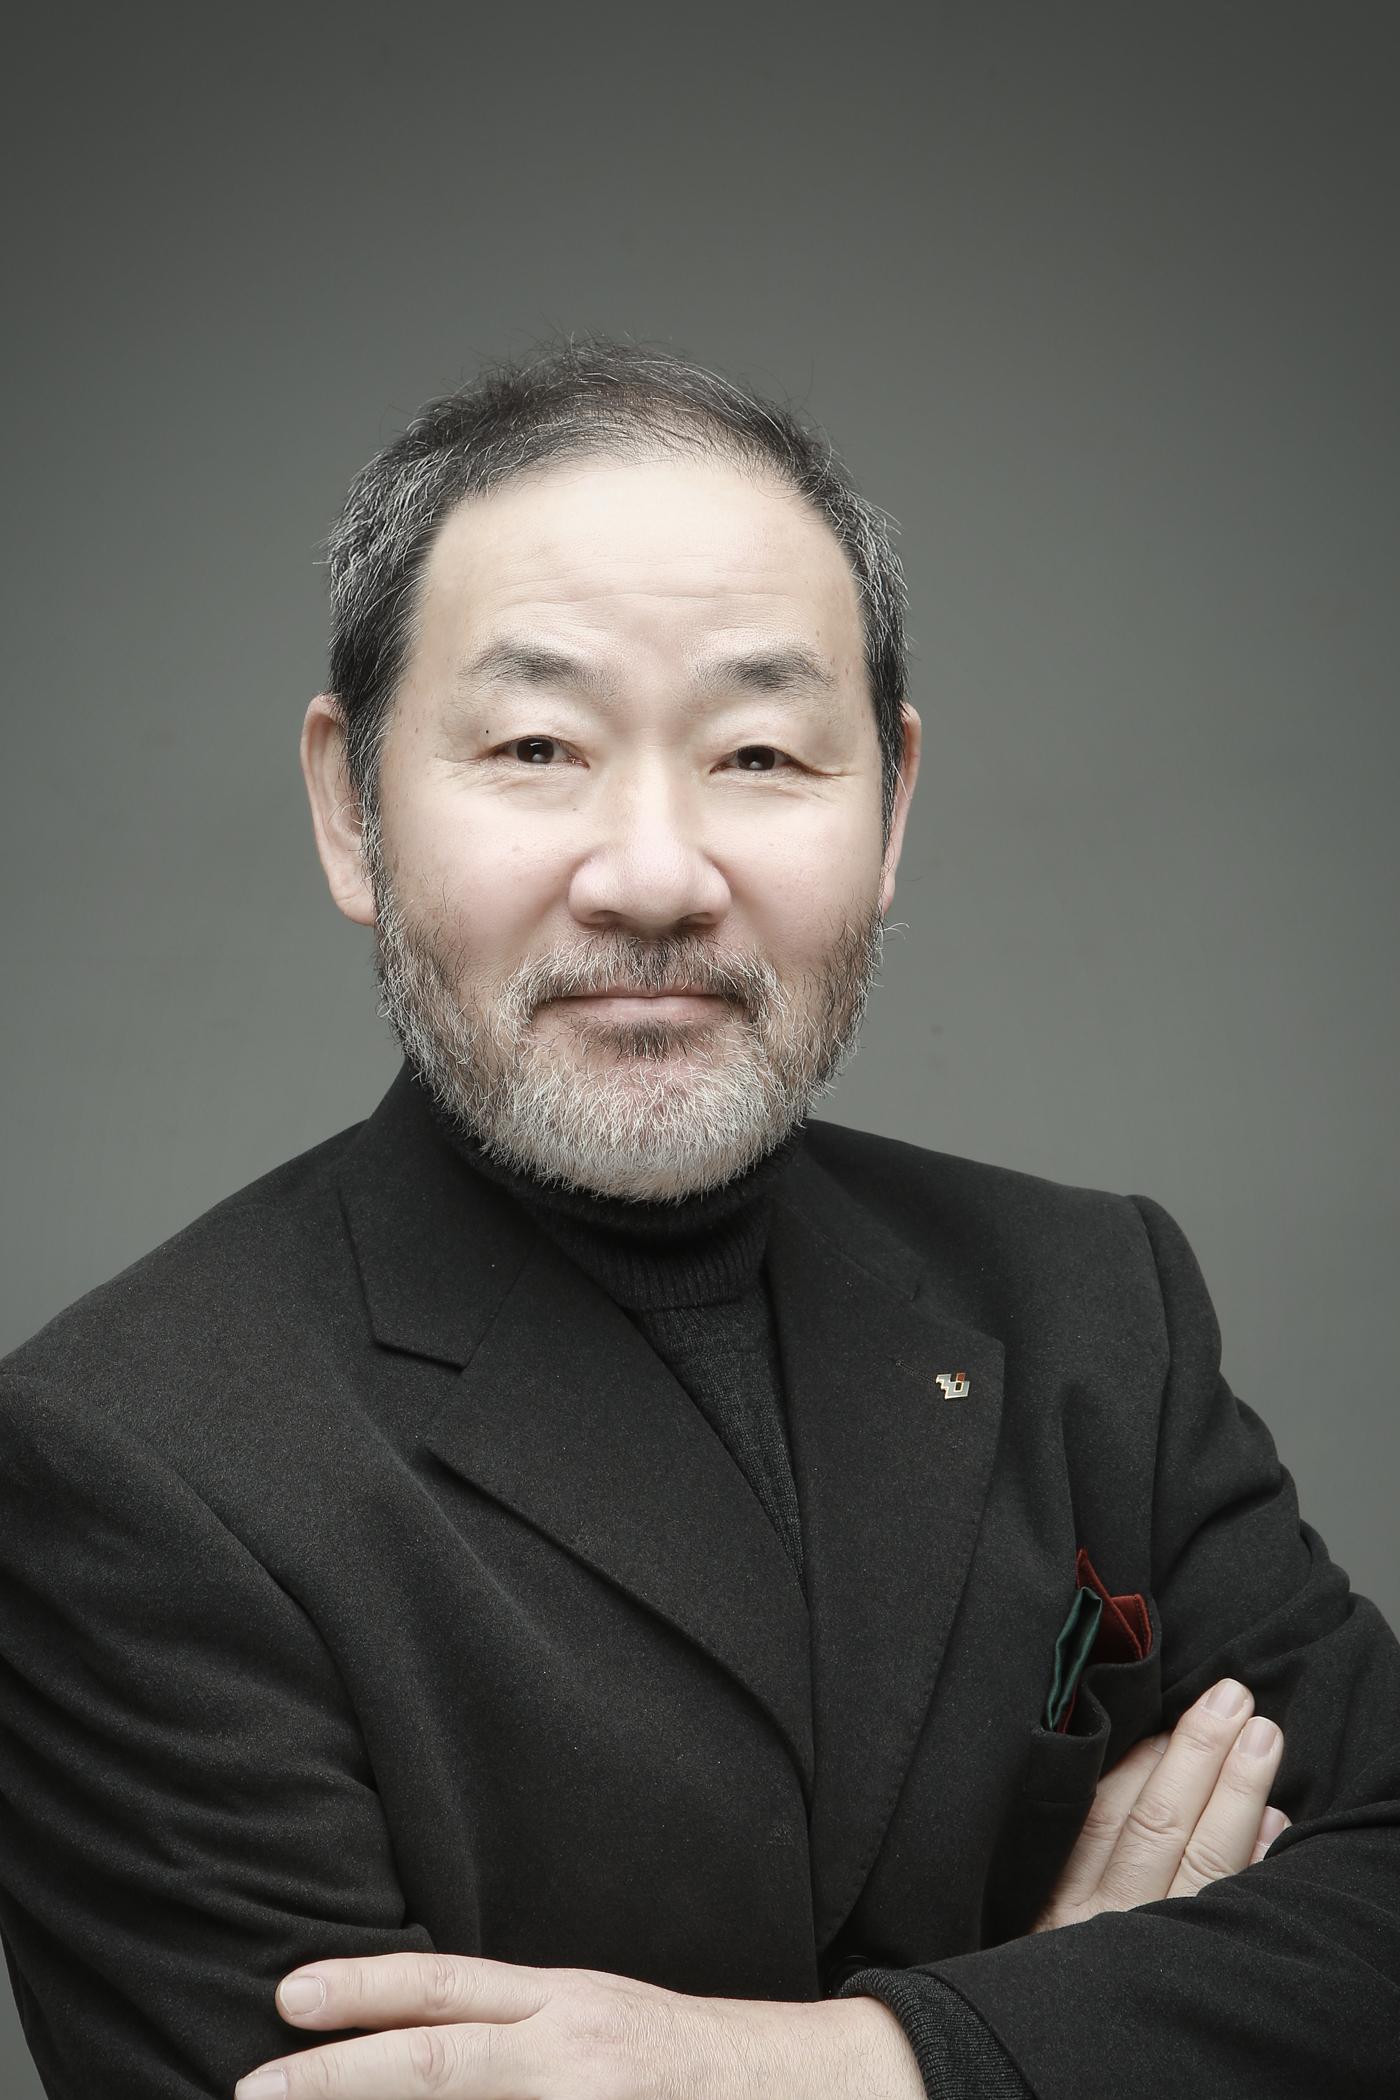 〔ANN의 인물 뉴스〕 한국건축가협회 강철희 신임 회장, 21일 취임